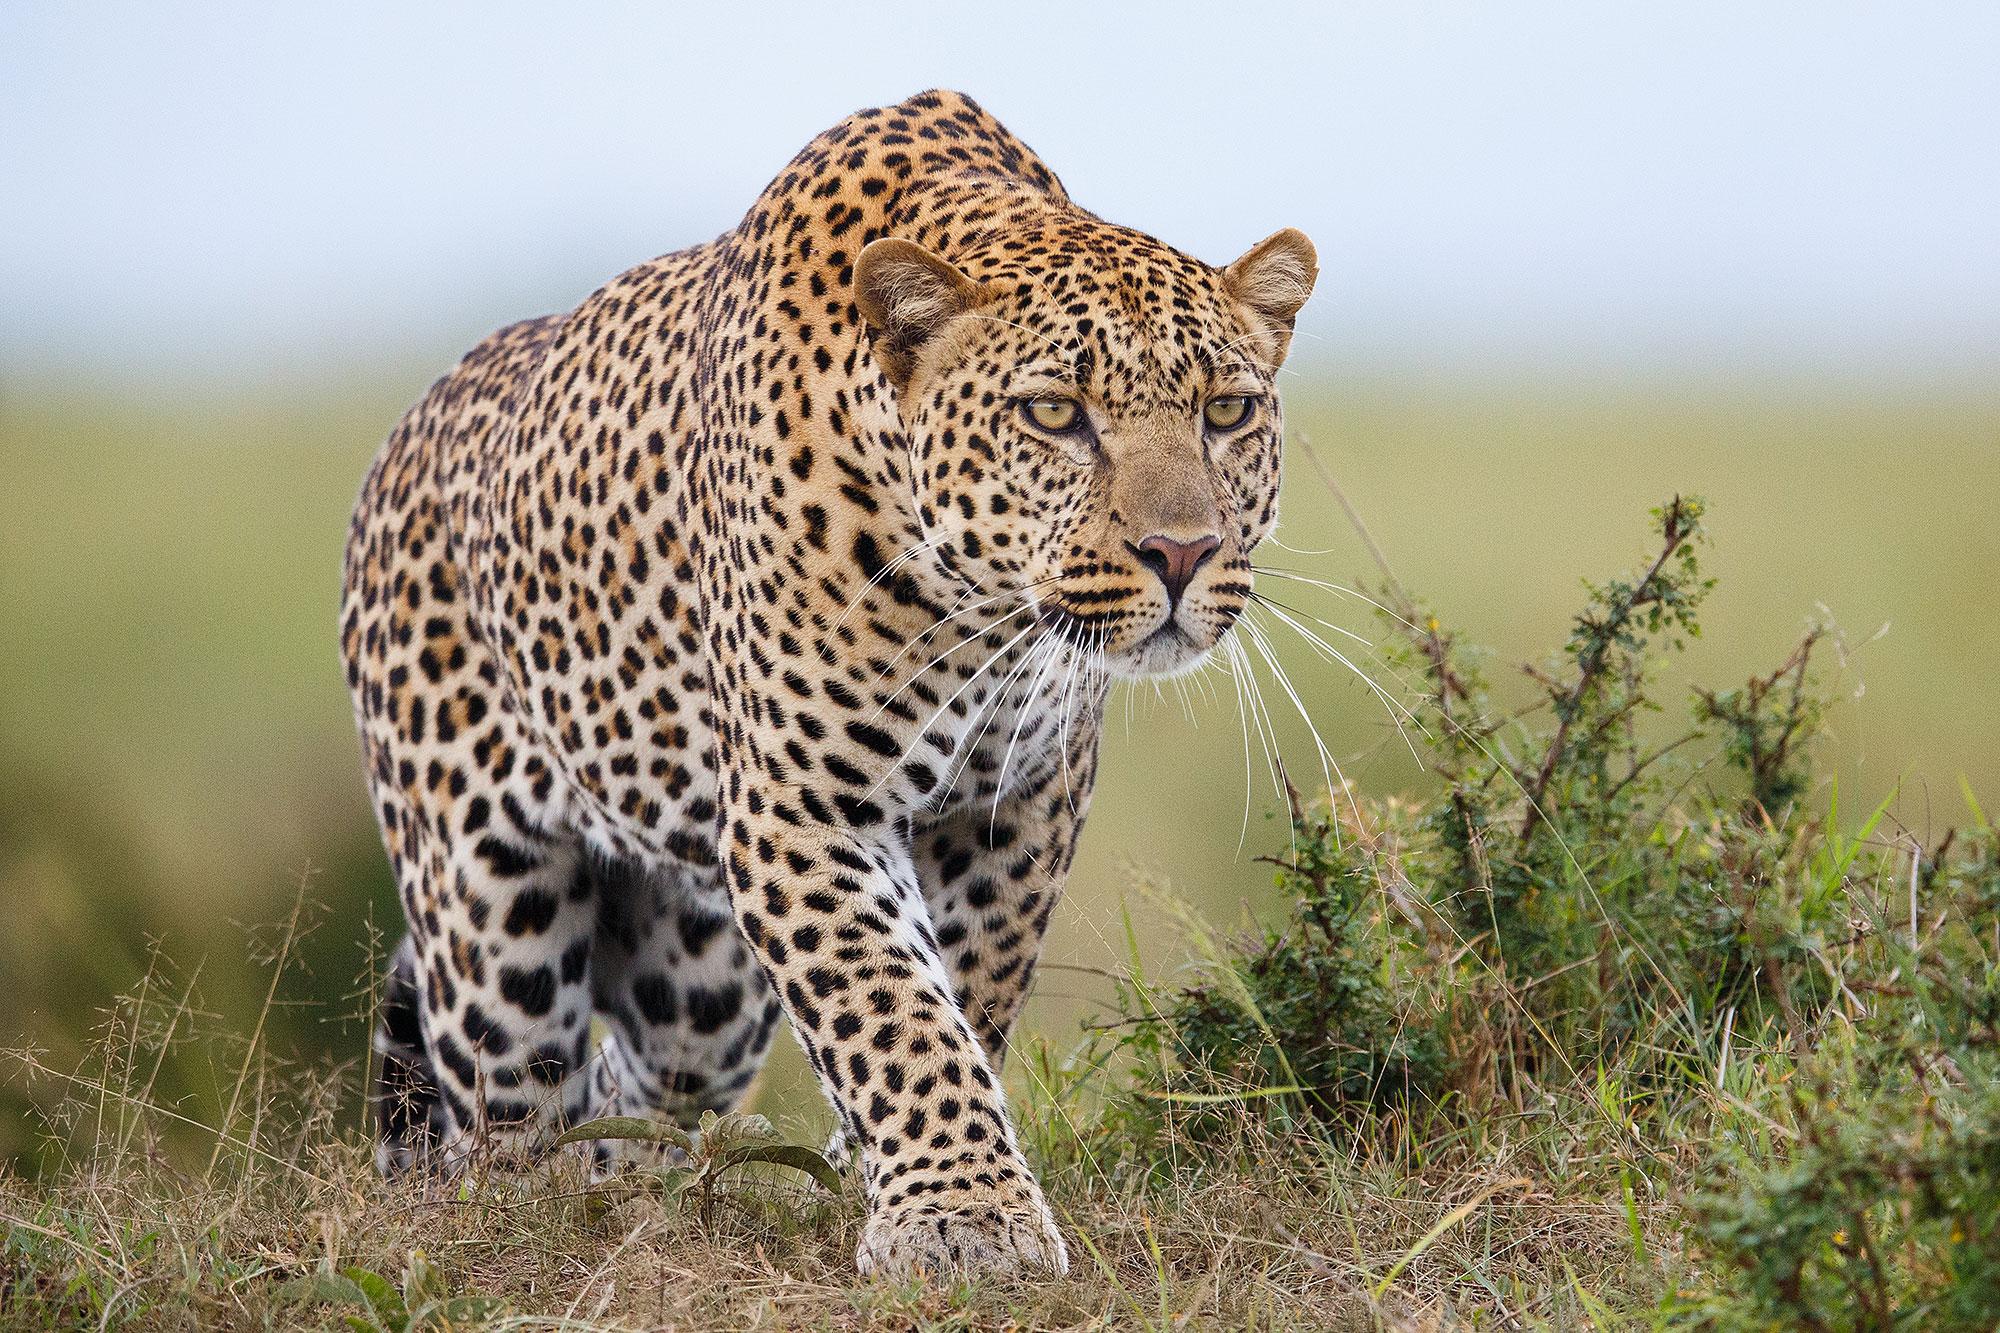 3-Year-Old Boy Killed By Leopard in Ugandan Safari Park | PEOPLE.com